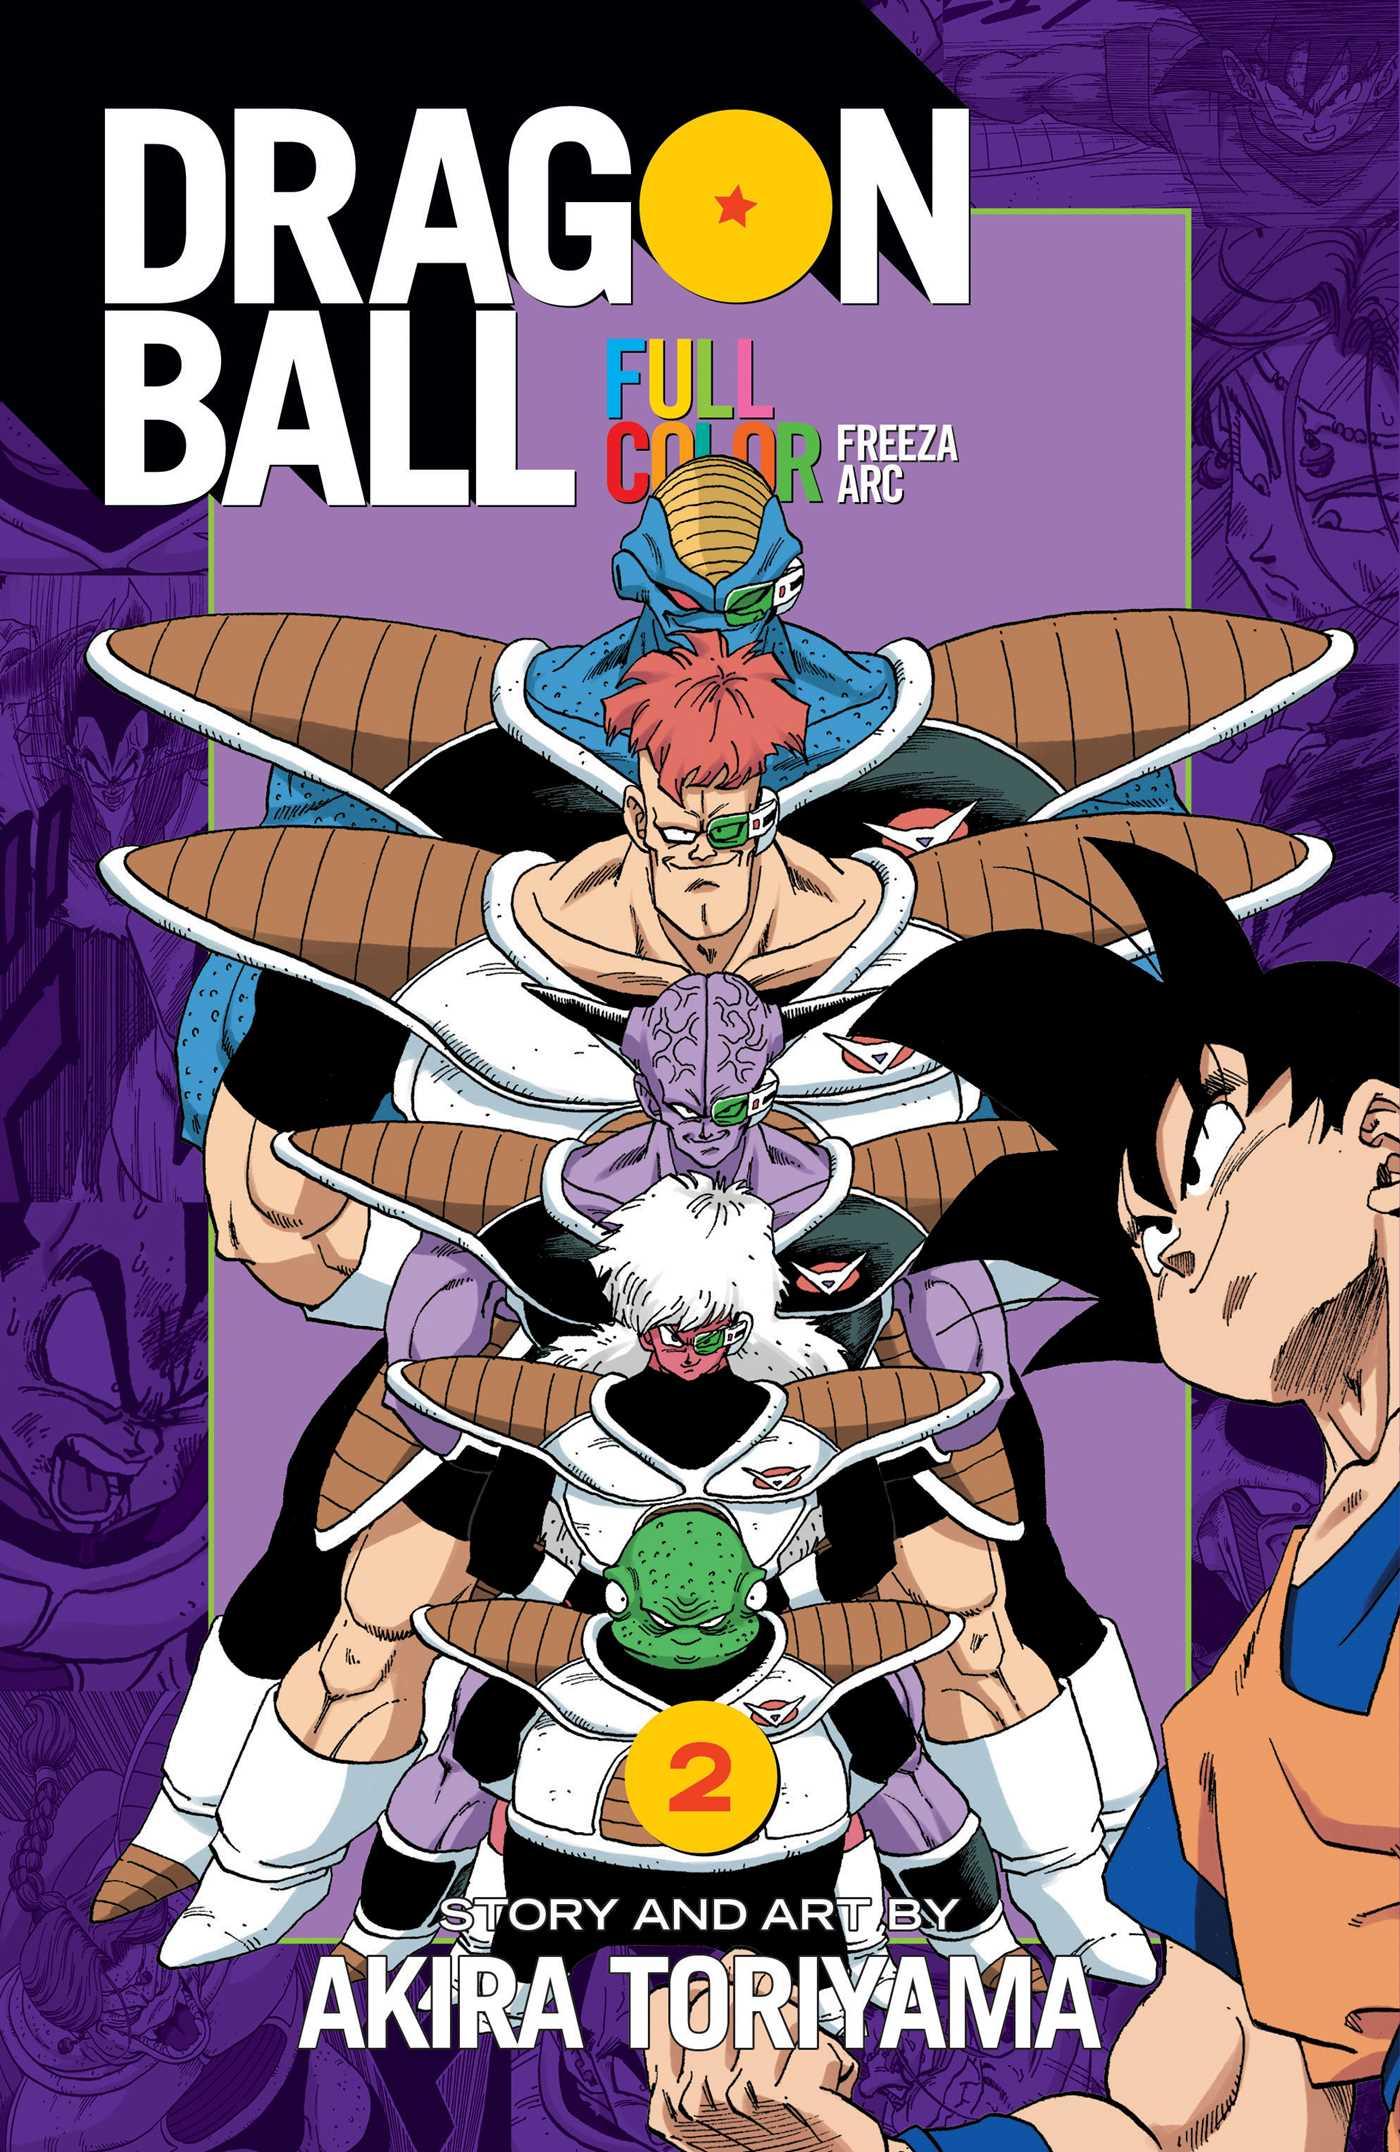 Dragon Ball Full Color Freeza Arc, Vol. 2   Book by Akira Toriyama ...